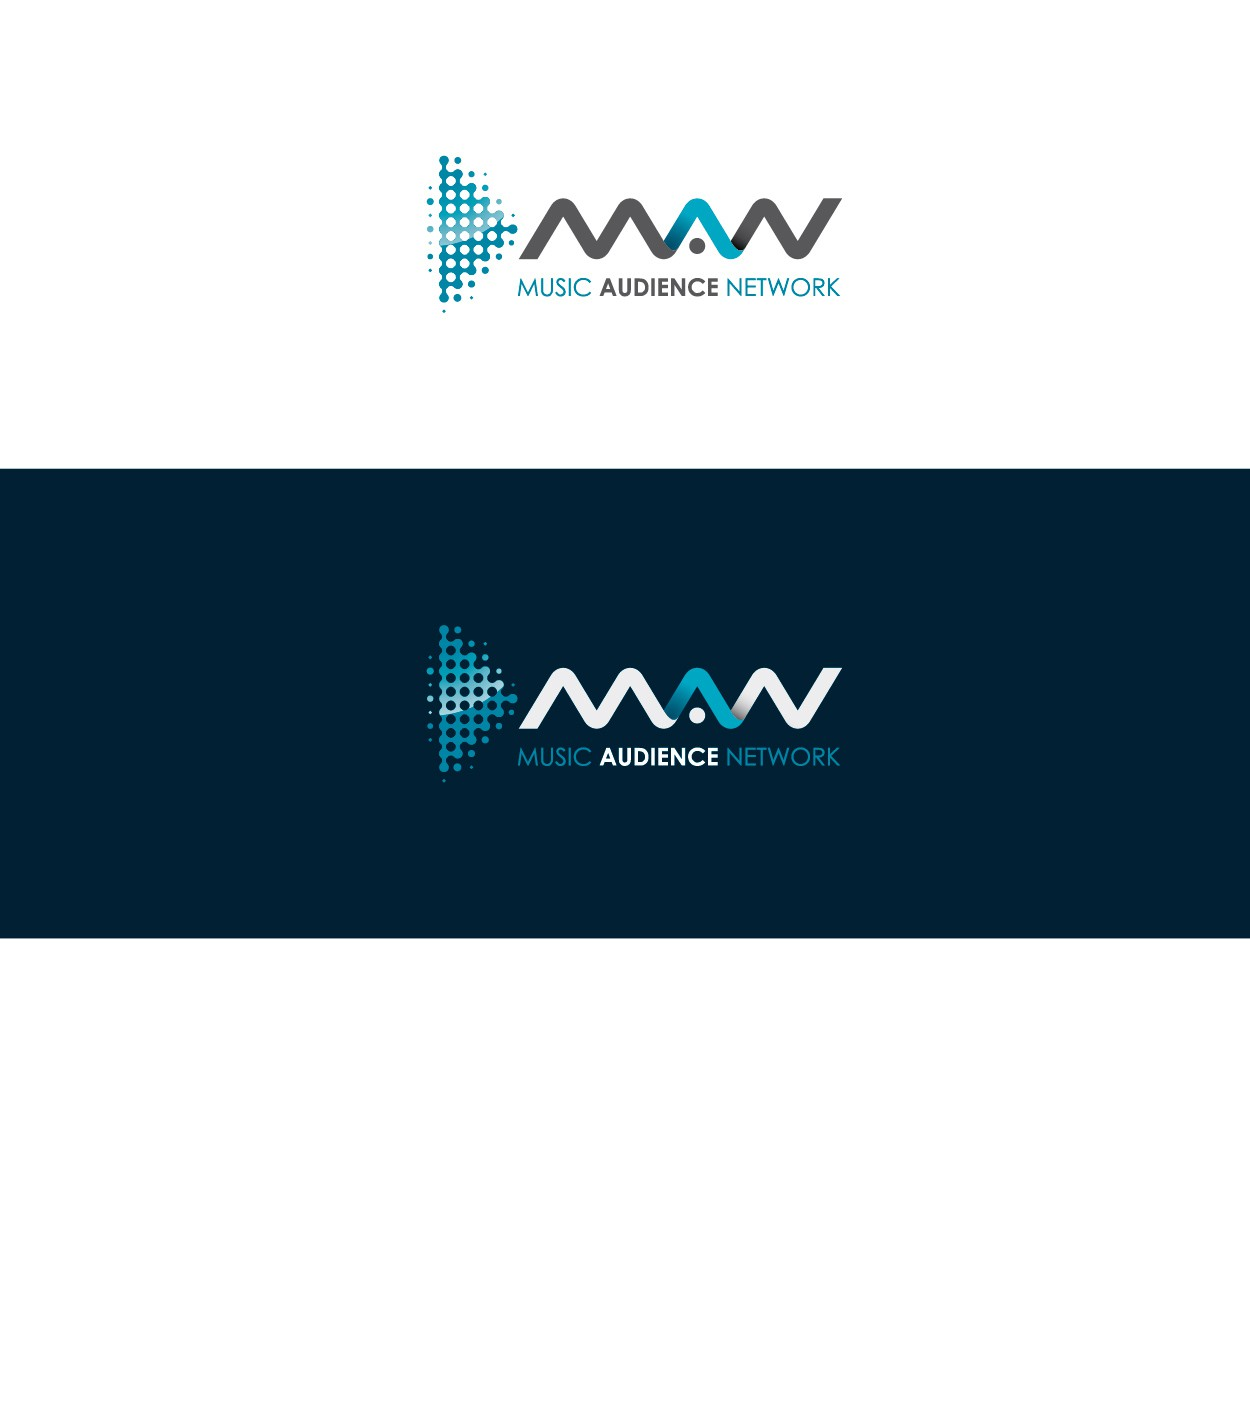 Founder of $500M NASDAQ marketing co. needs logo for new music technology biz